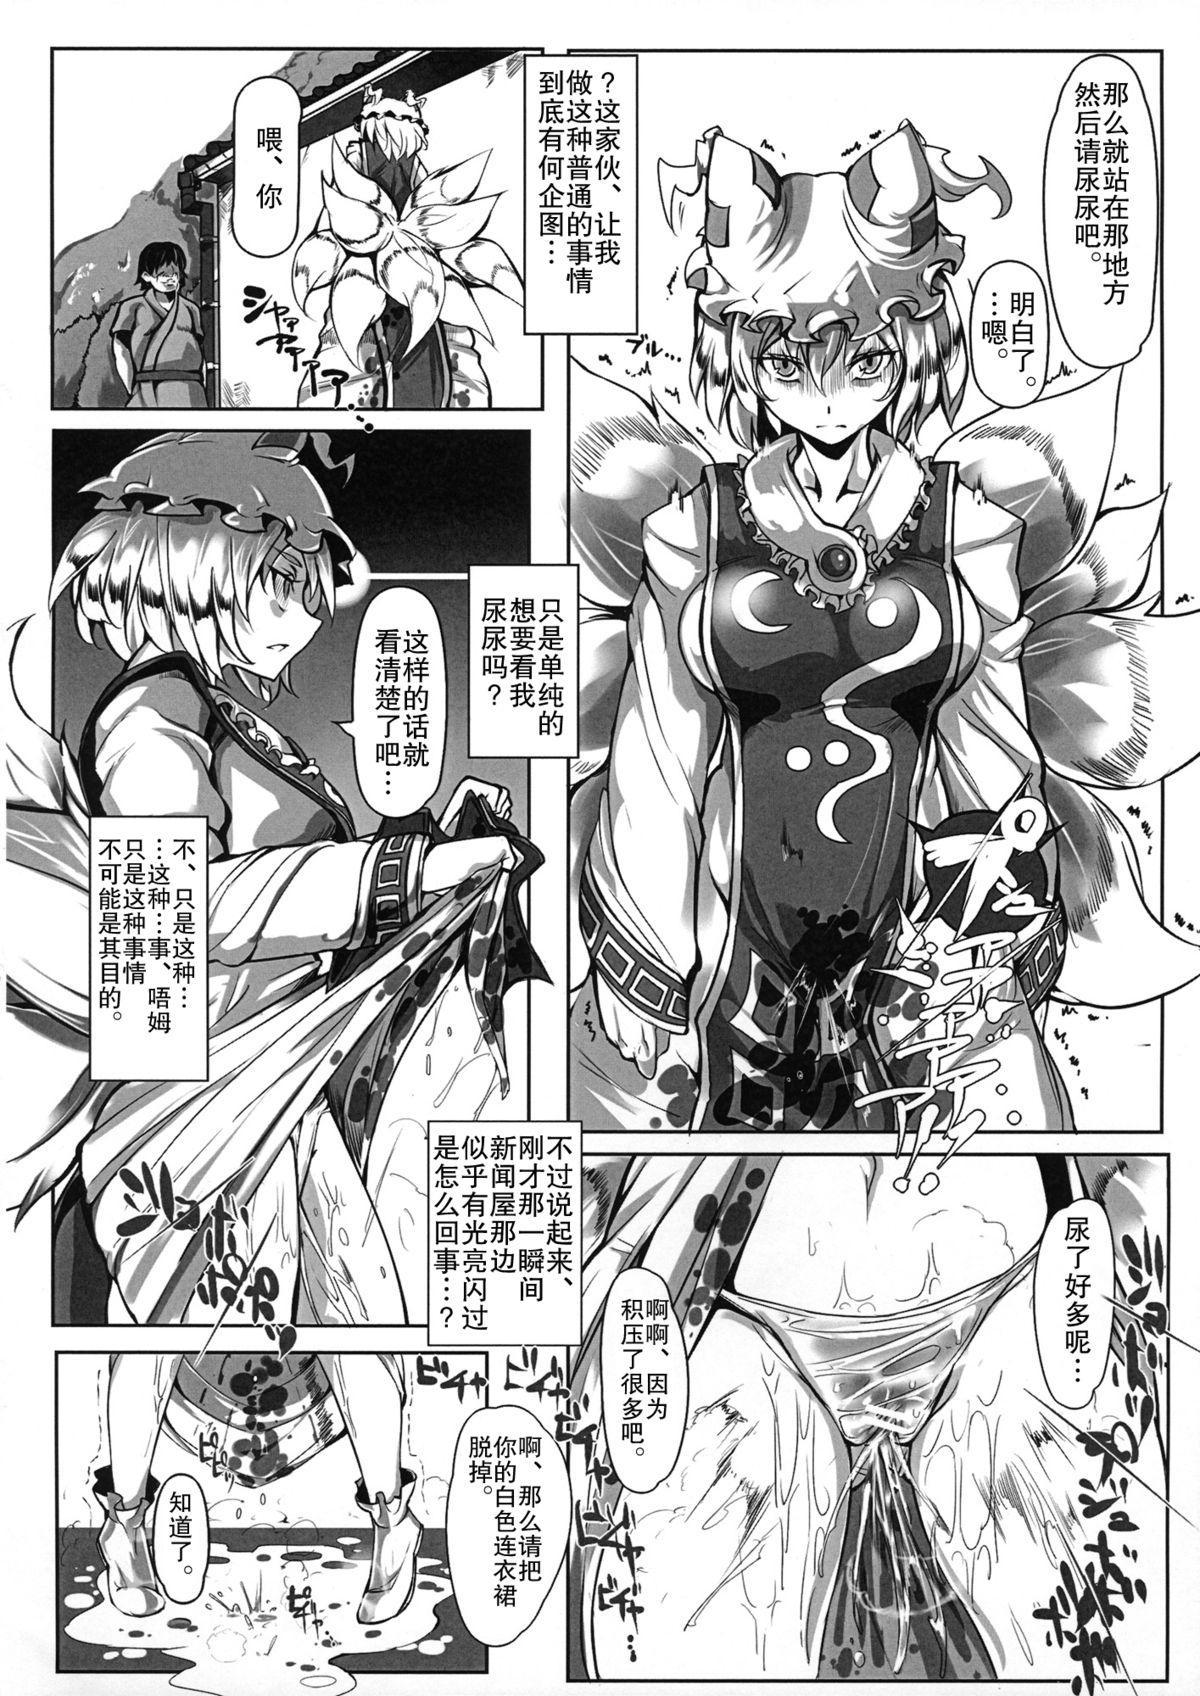 (Reitaisai 10) [Nyuu Koubou (Nyuu)] Saimin Nante Kakaranai!!! (Touhou Project)) [Chinese] [后悔的神官个人汉化] 21